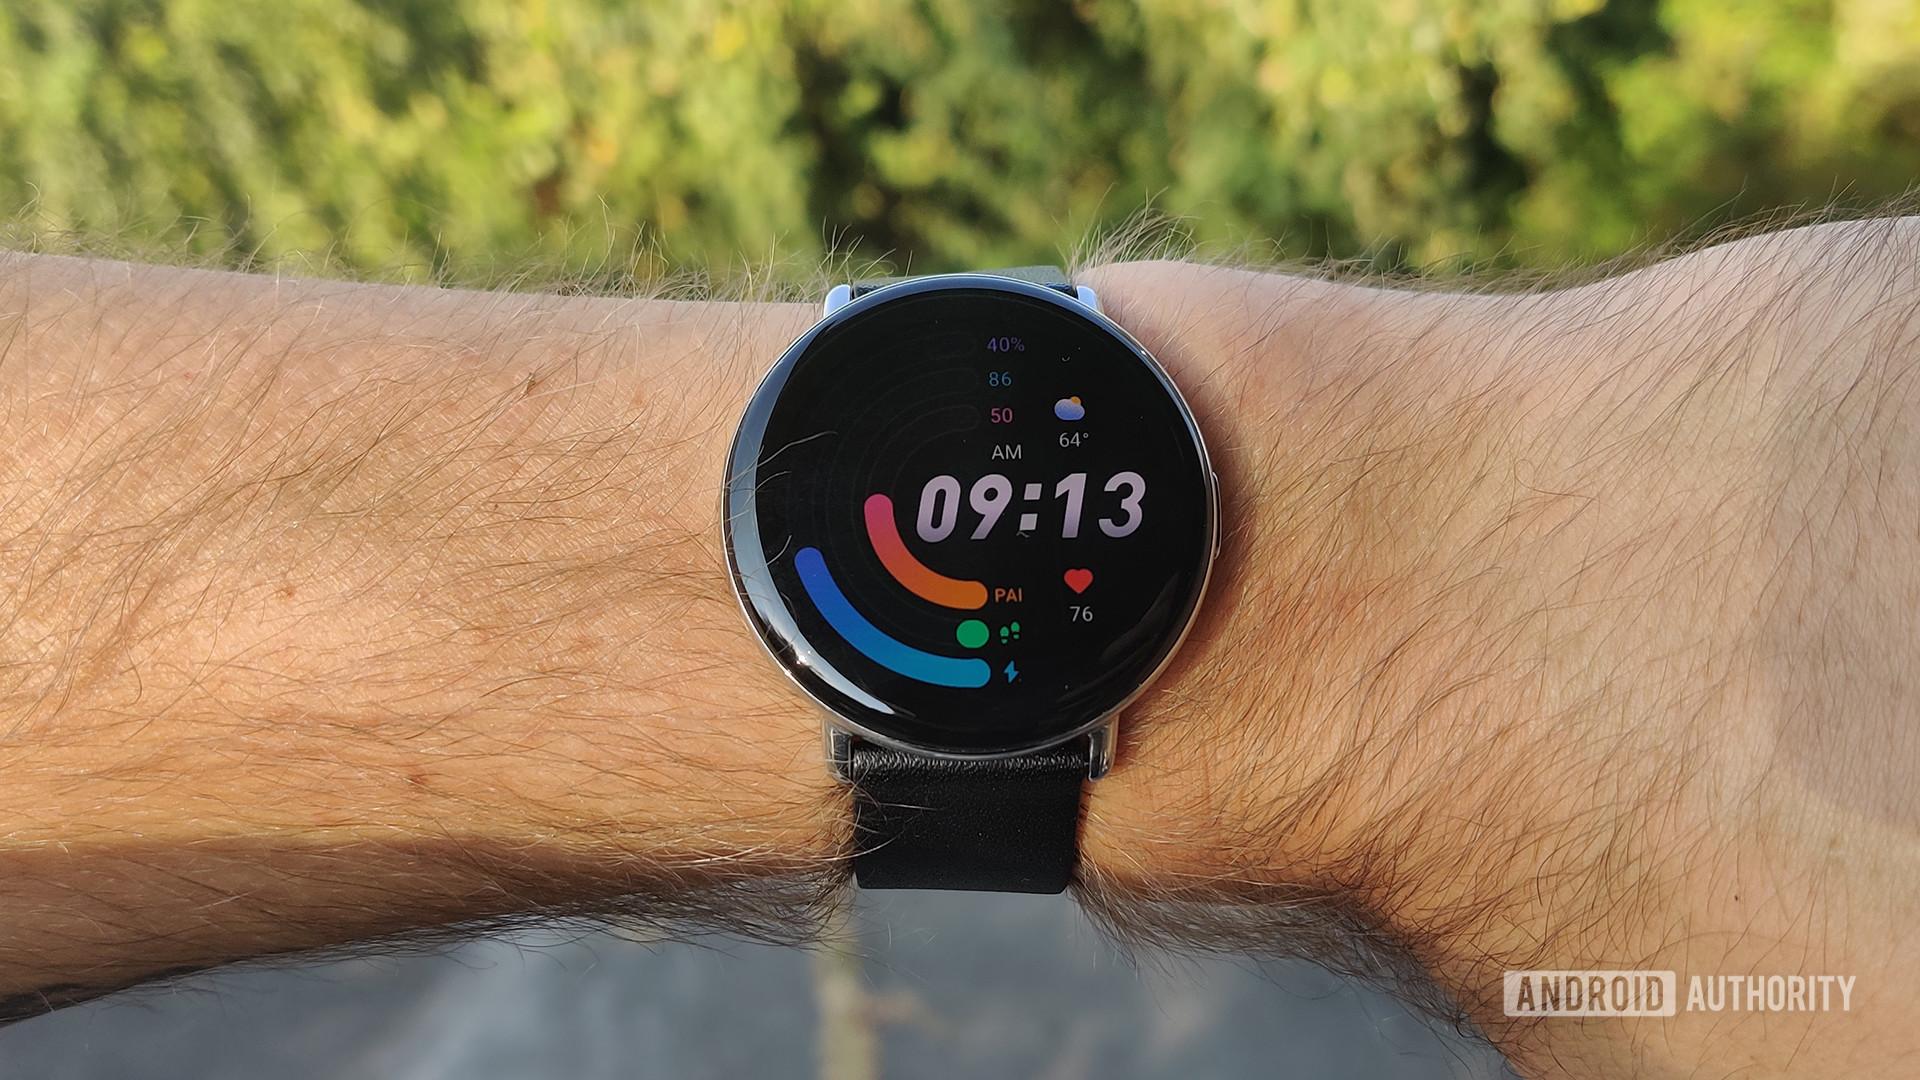 Zepp E Circle Review on Wrist Watch Face